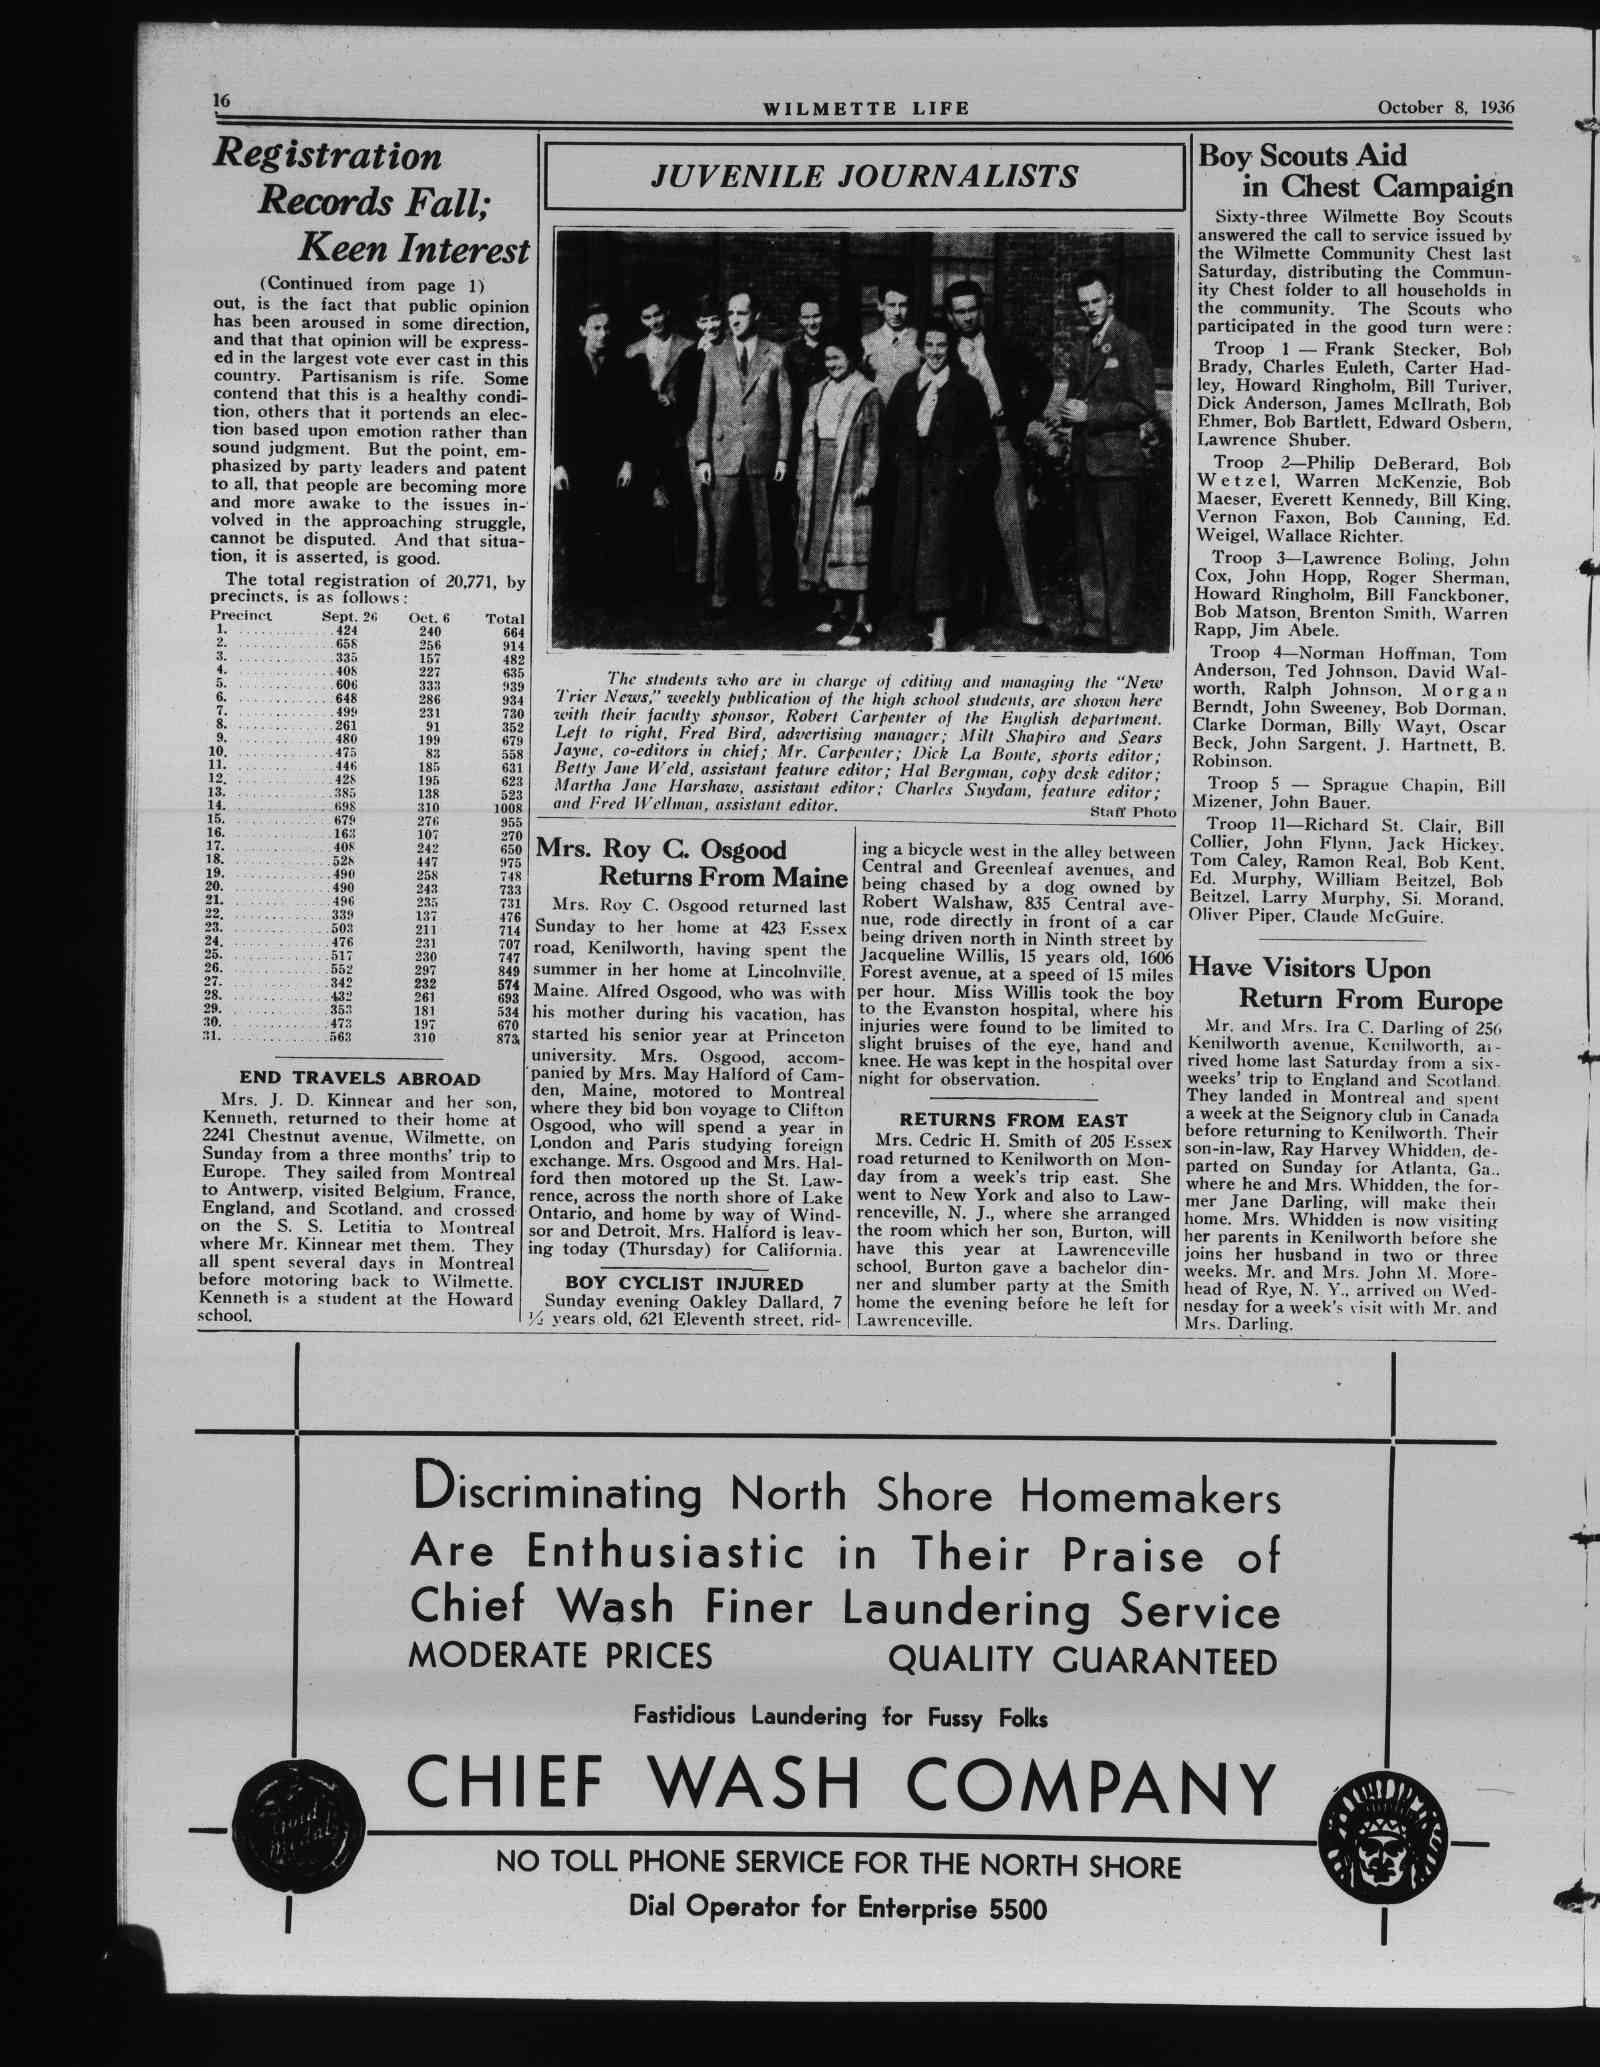 Wilmette Life (Wilmette, Illinois), 8 Oct 1936